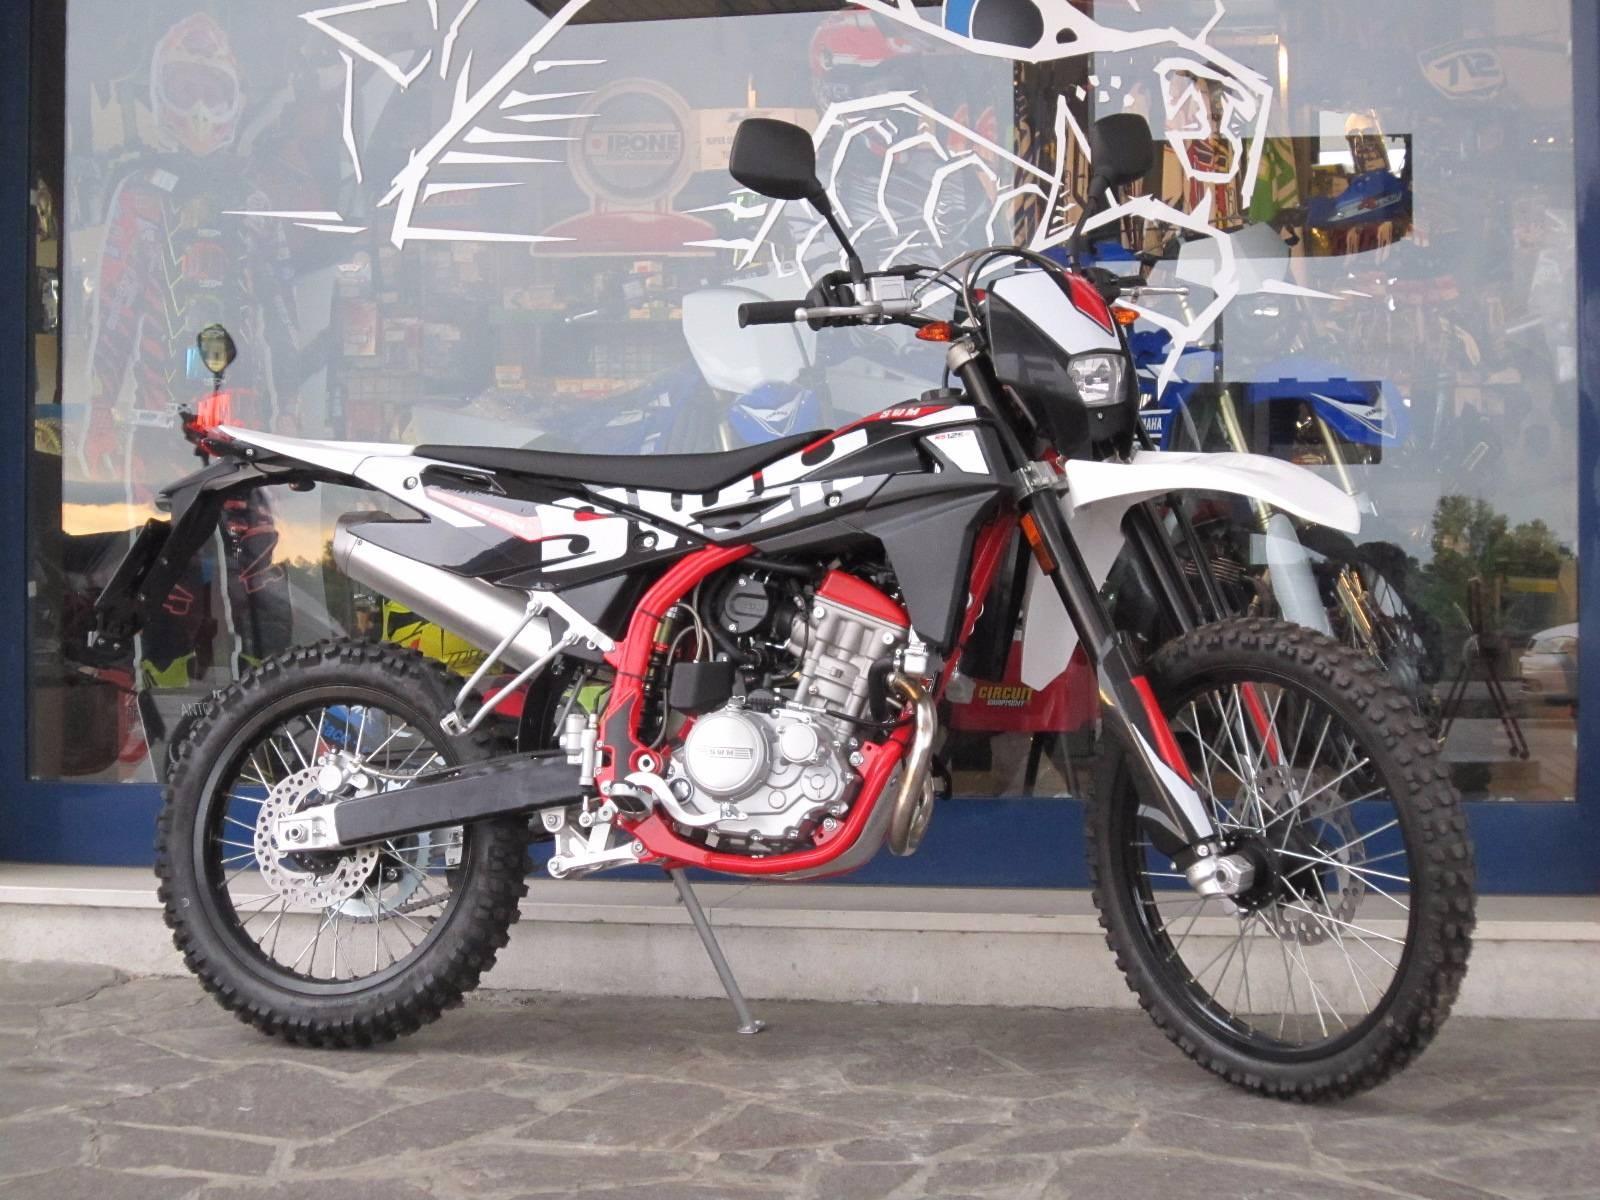 SWM RS 125